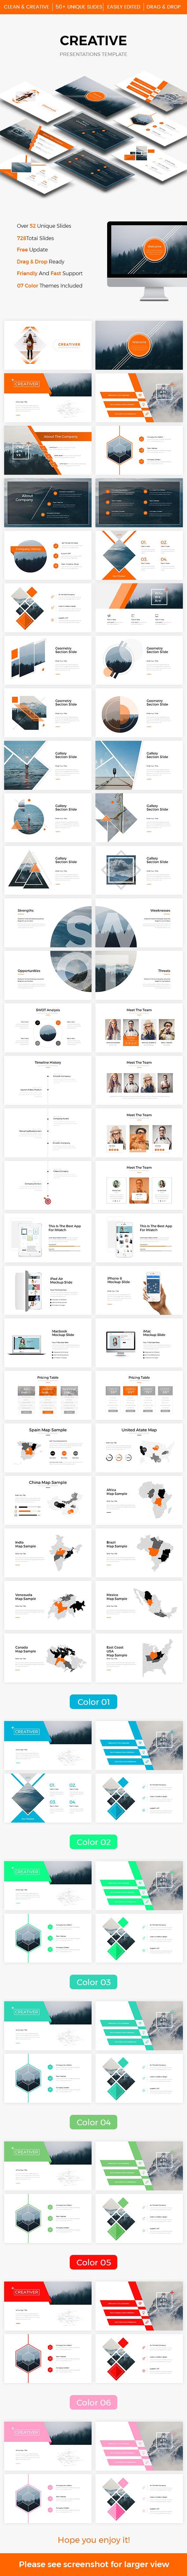 CREATIVE Powerpoint Template 2017 - Creative PowerPoint Templates